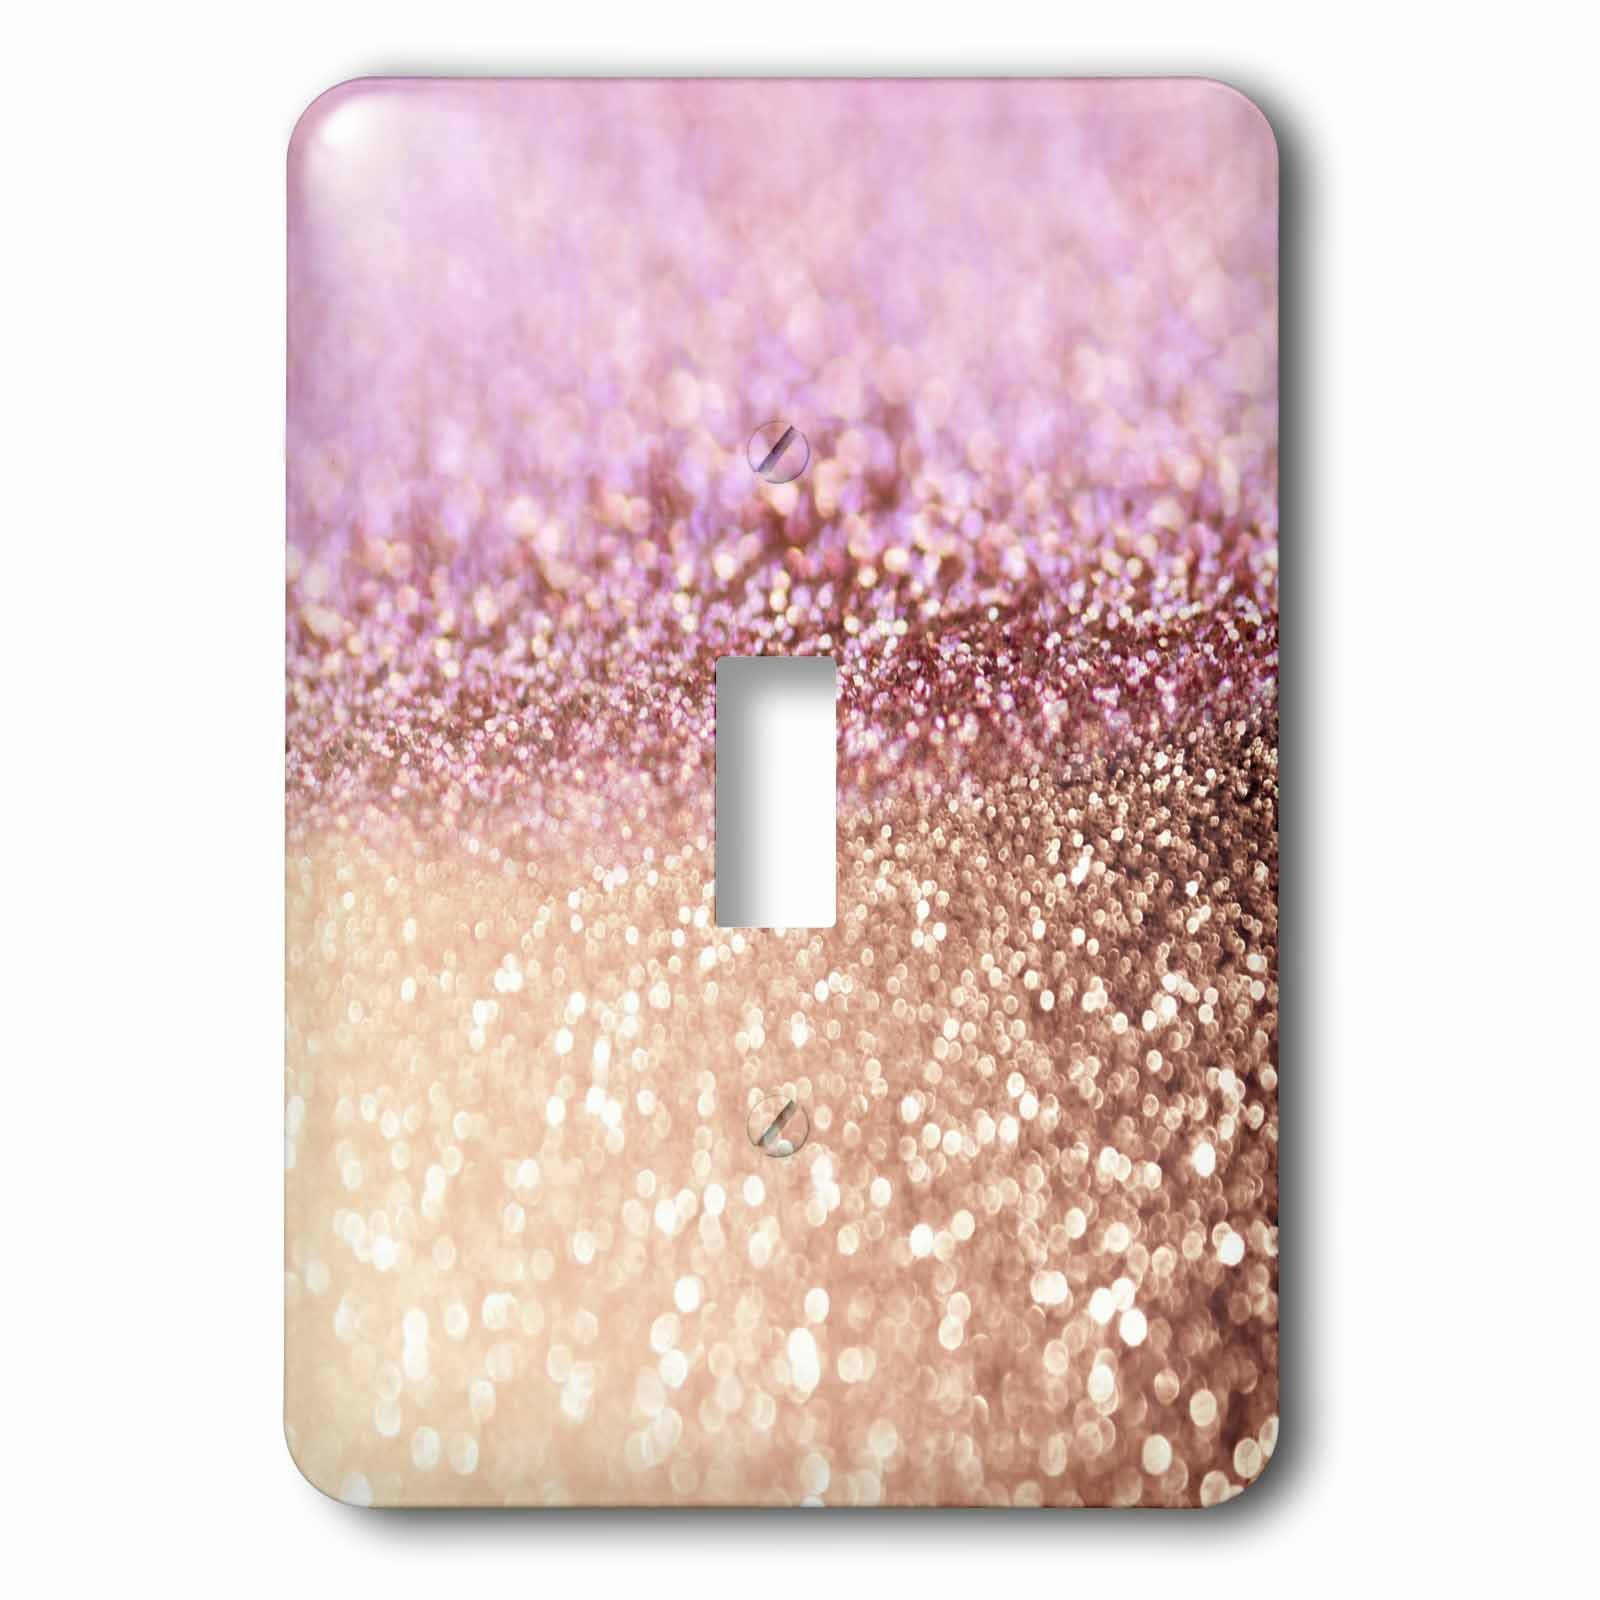 3dRose (lsp_272849_1) Single Toggle Switch (1) Sparkling Rose Gold Pink Luxury Shine Girly Elegant Mermaid Glitter